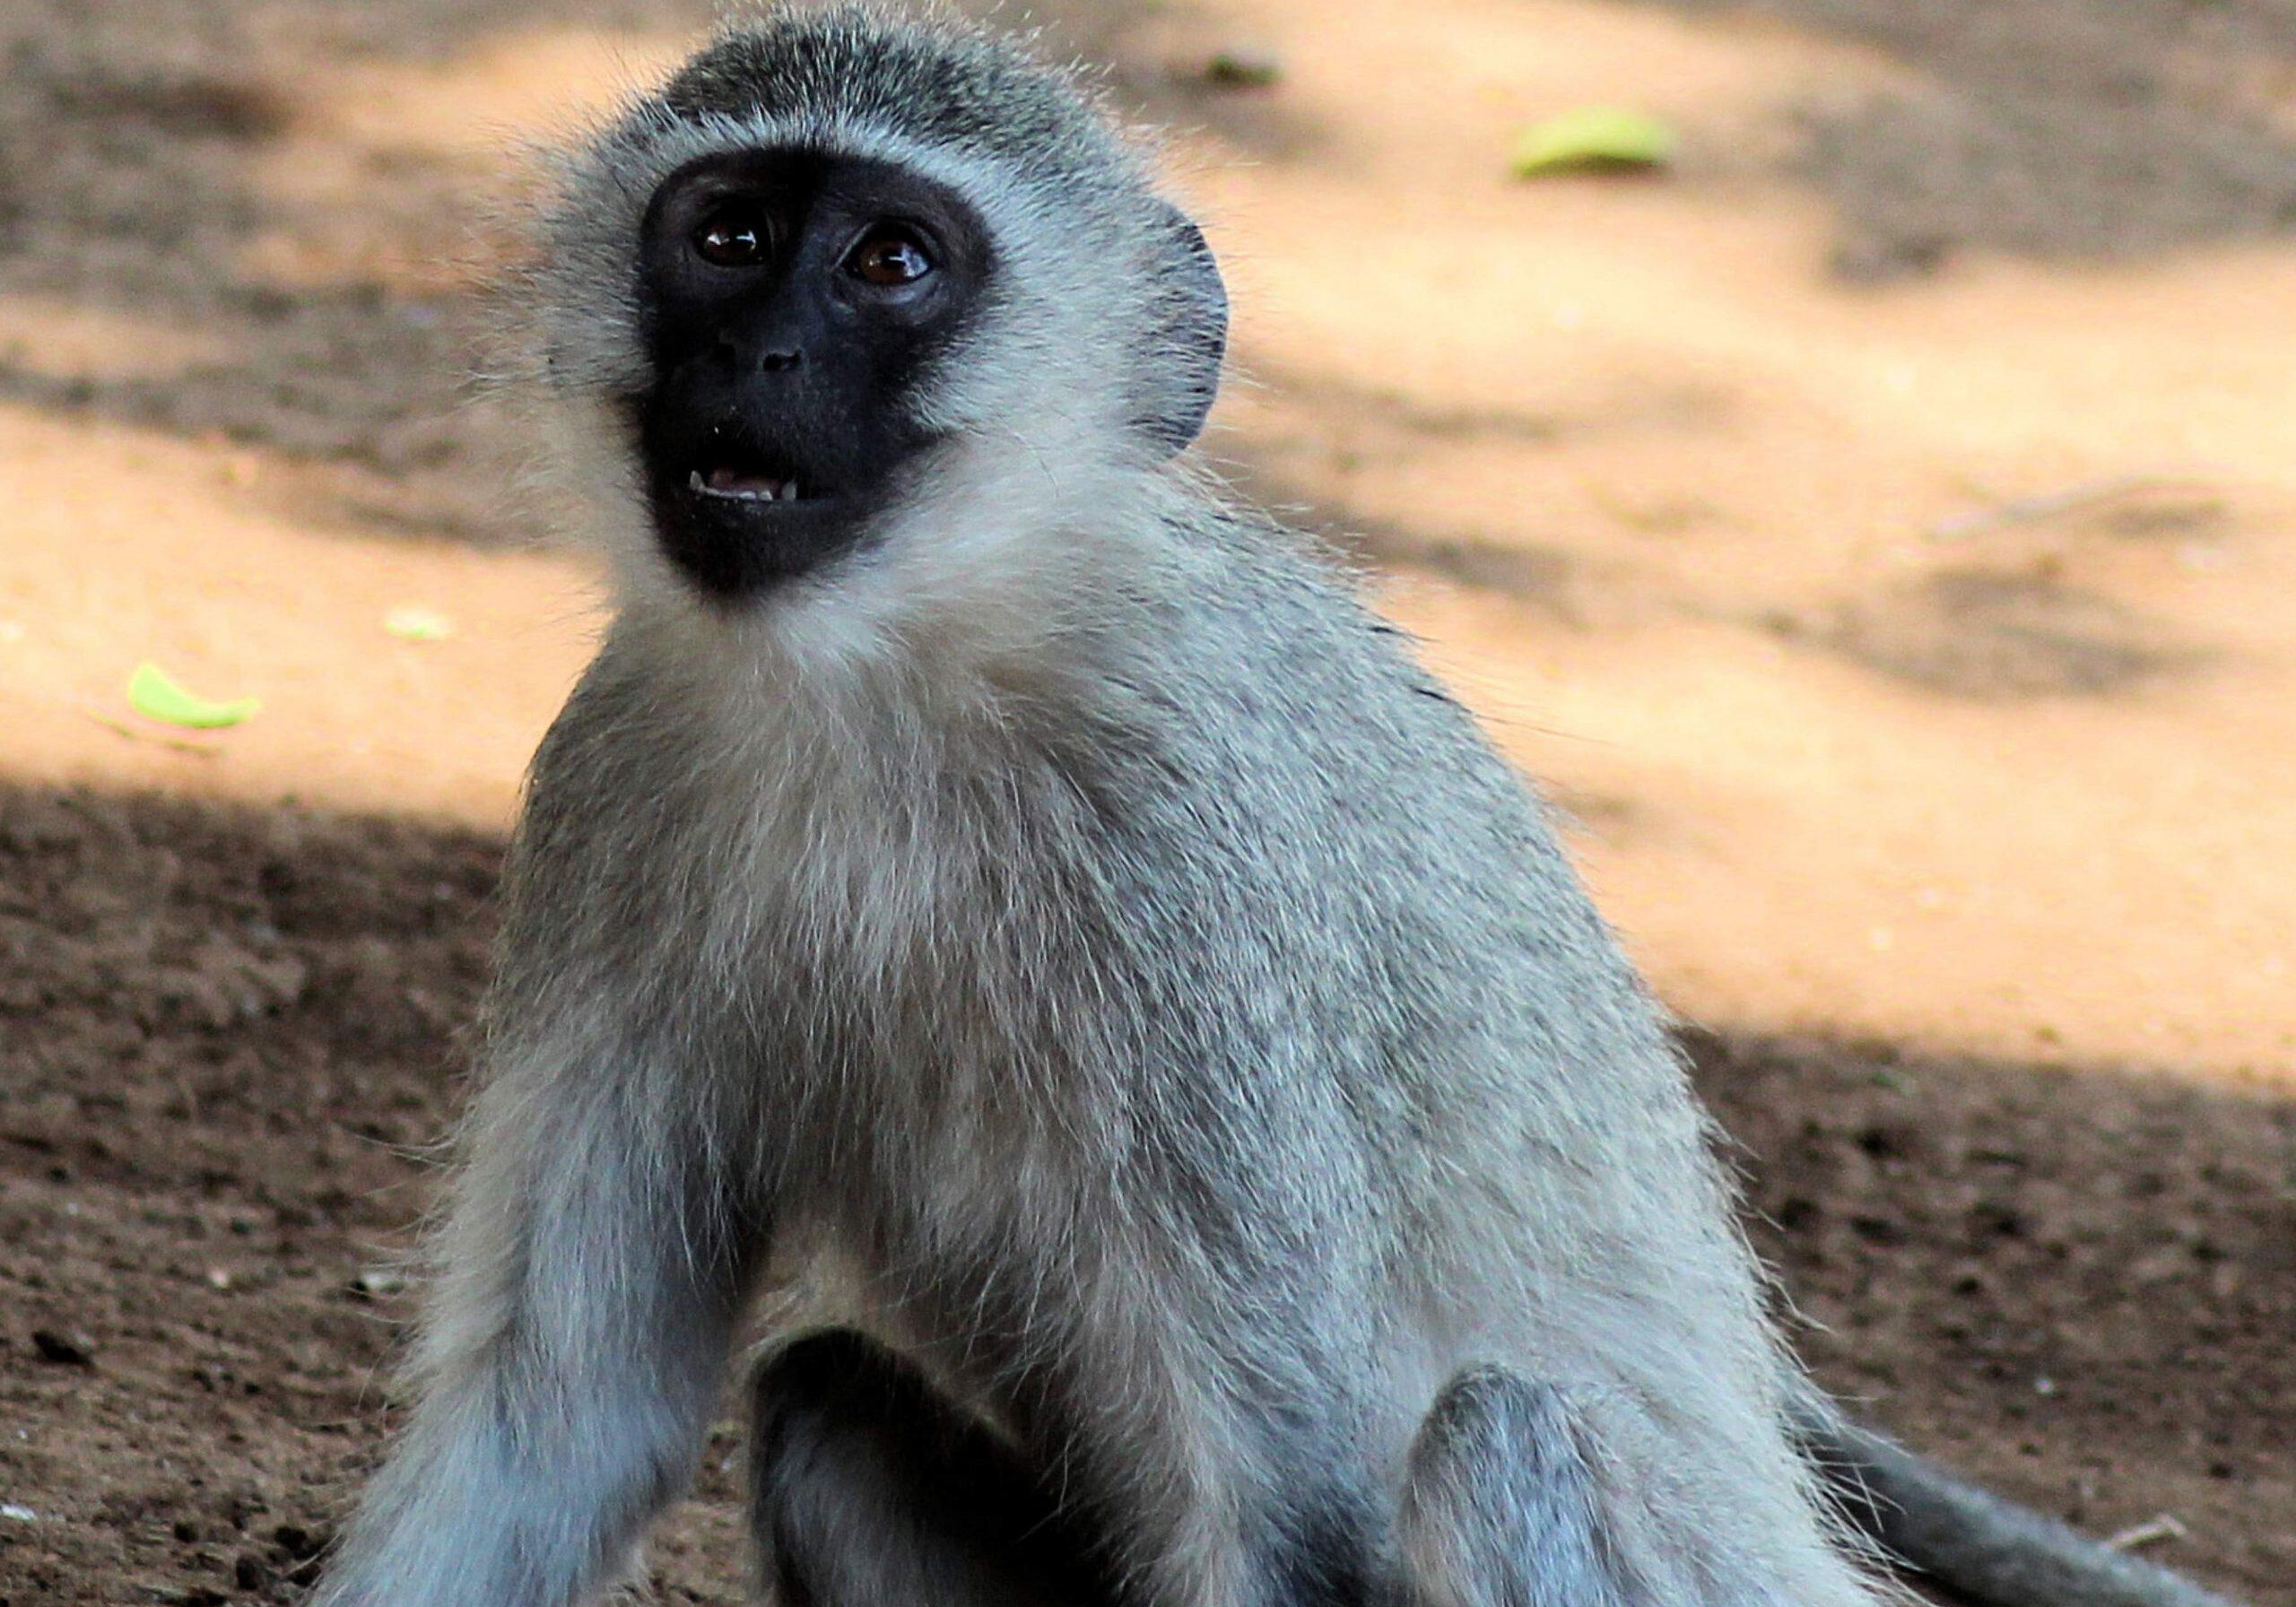 Vervet Monkey Xongi-tings Xongi-pedia (Mammal - Primate)